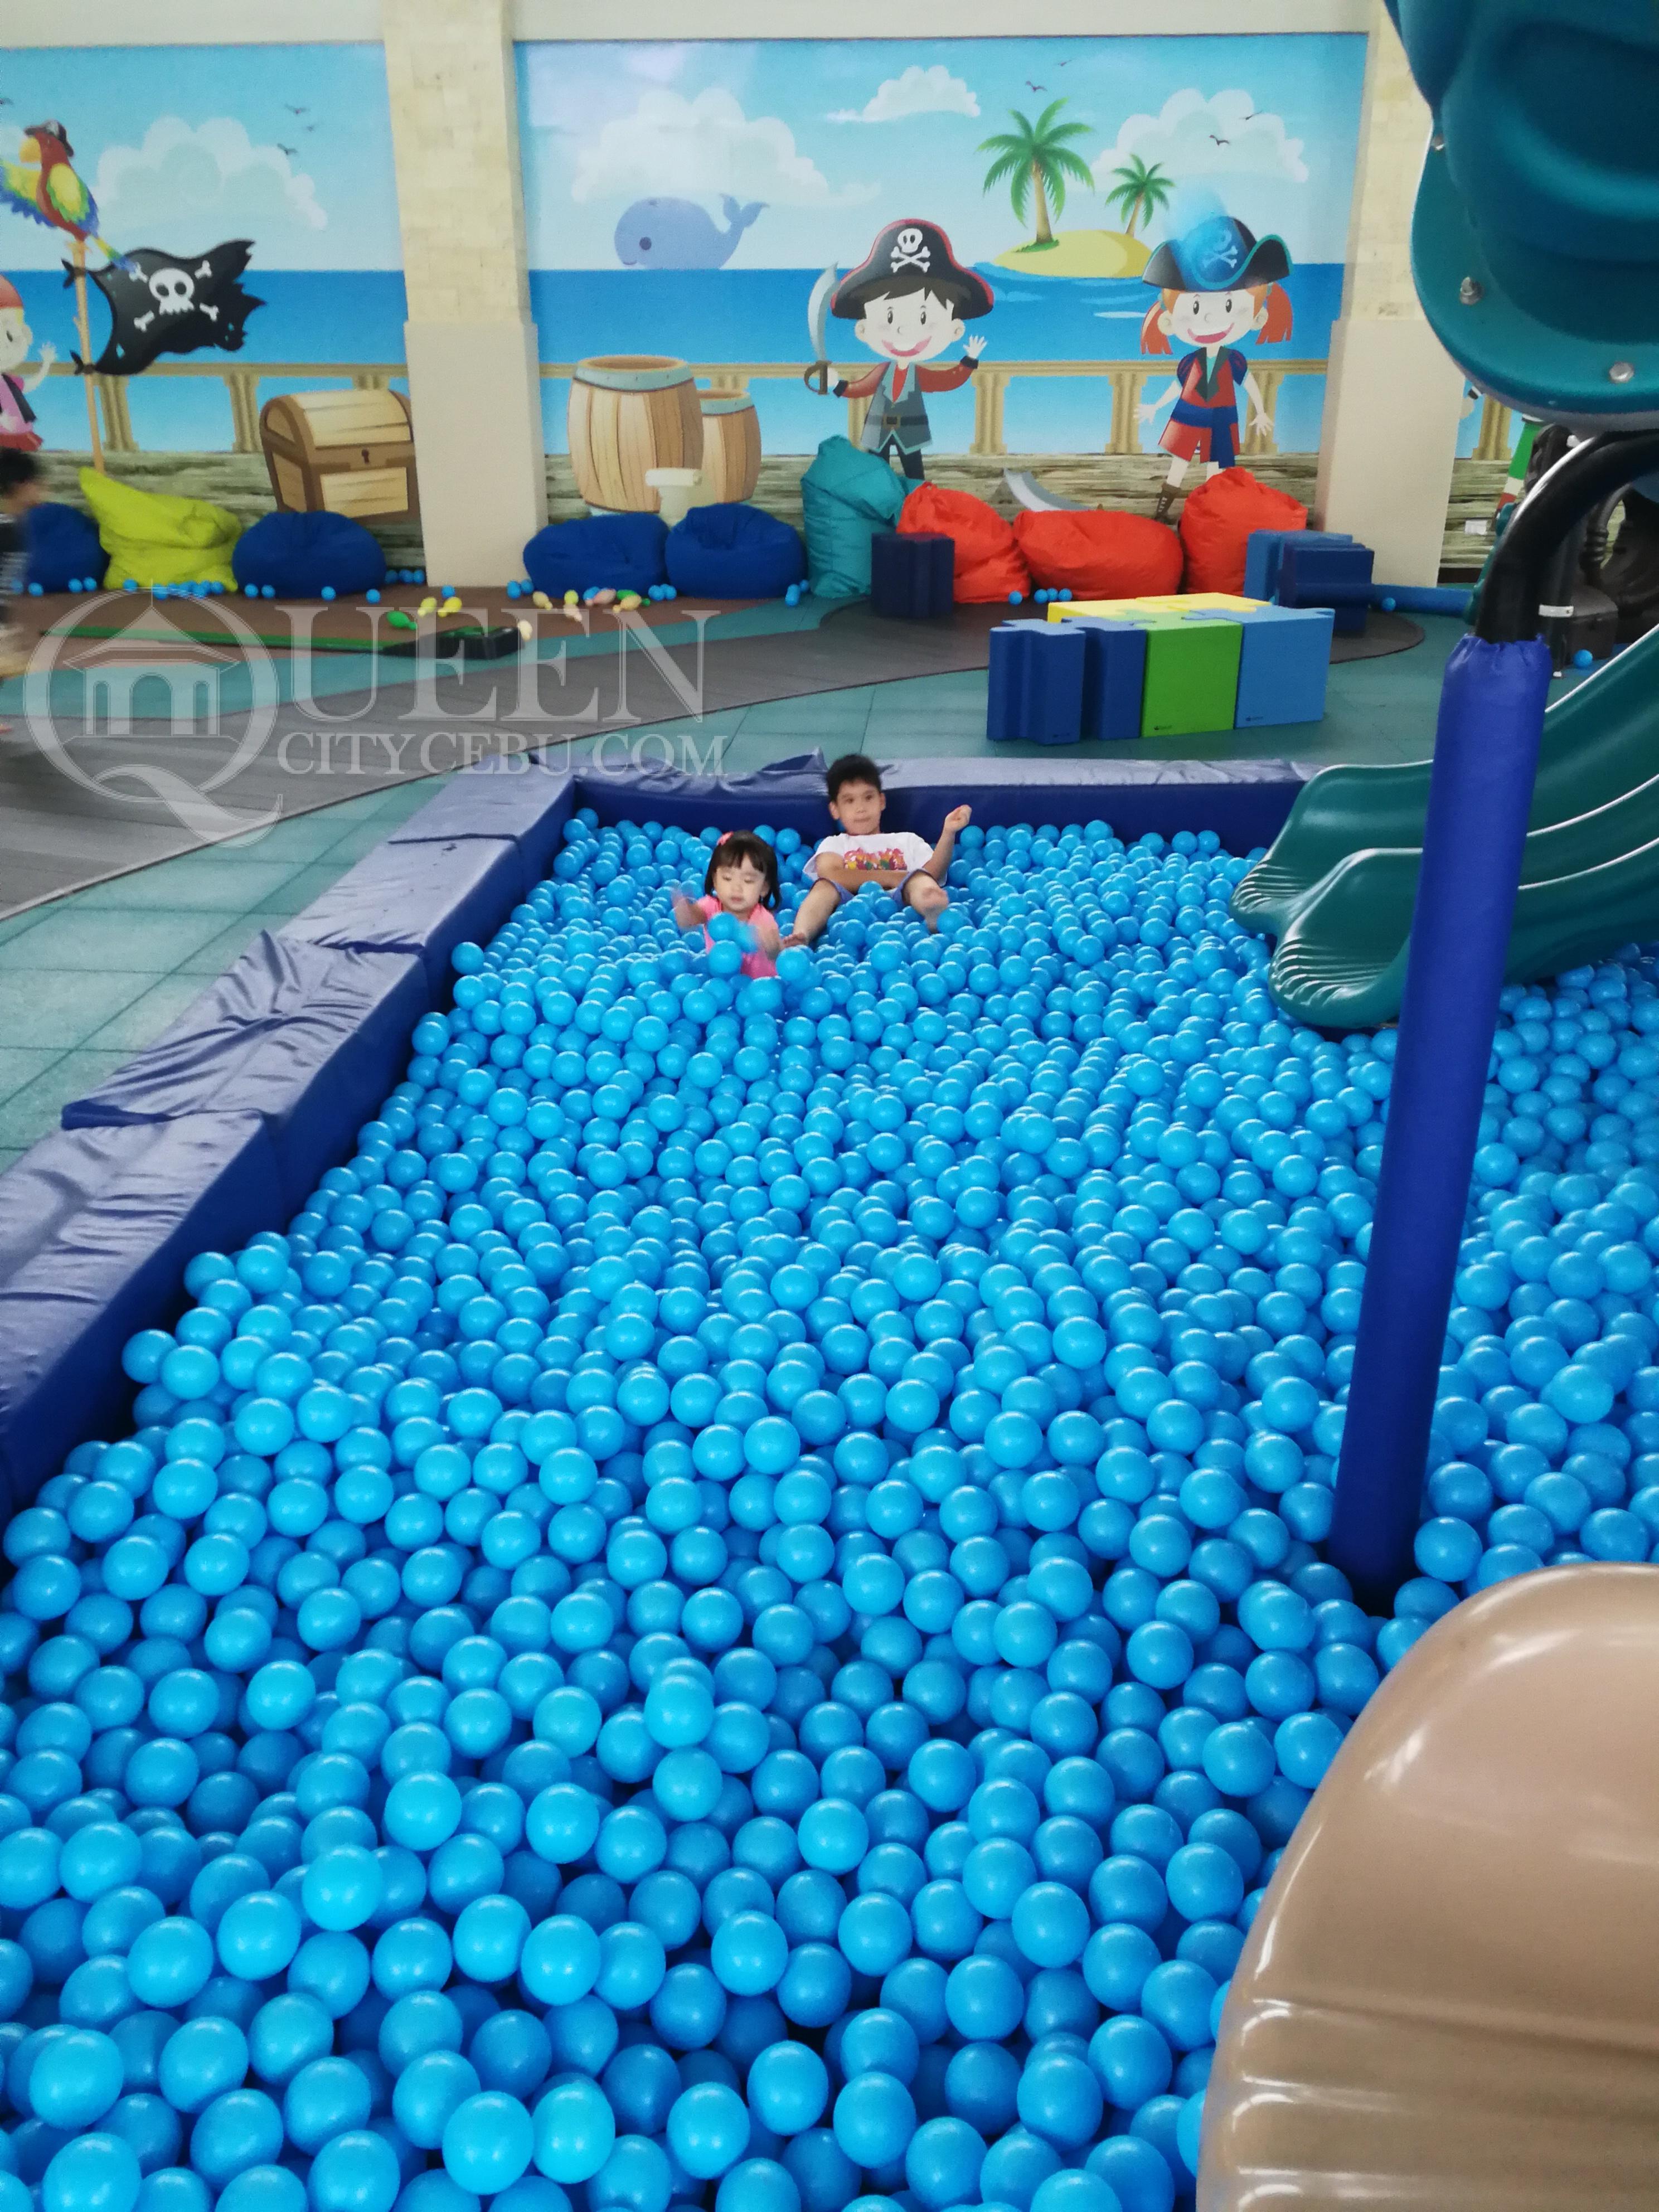 Crimson Resort's Crimzone Swimball Pool